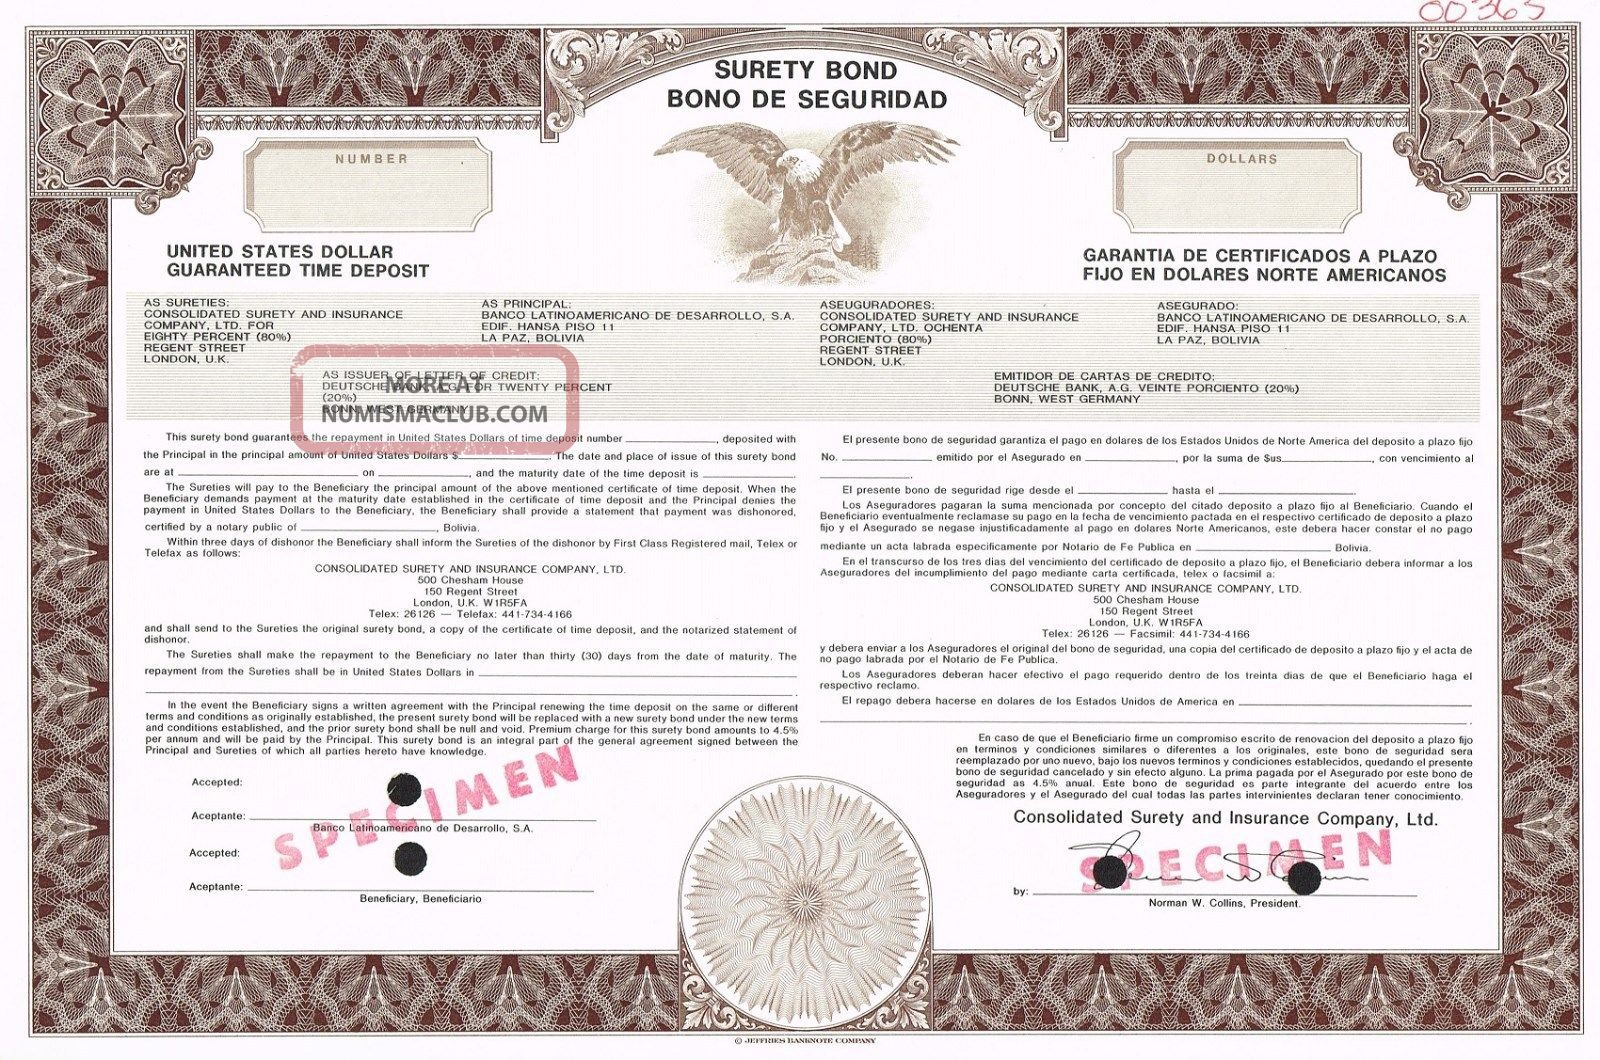 Consolidated Surety & Insurance Company Surety Bond Stock Certificate Specimen World photo